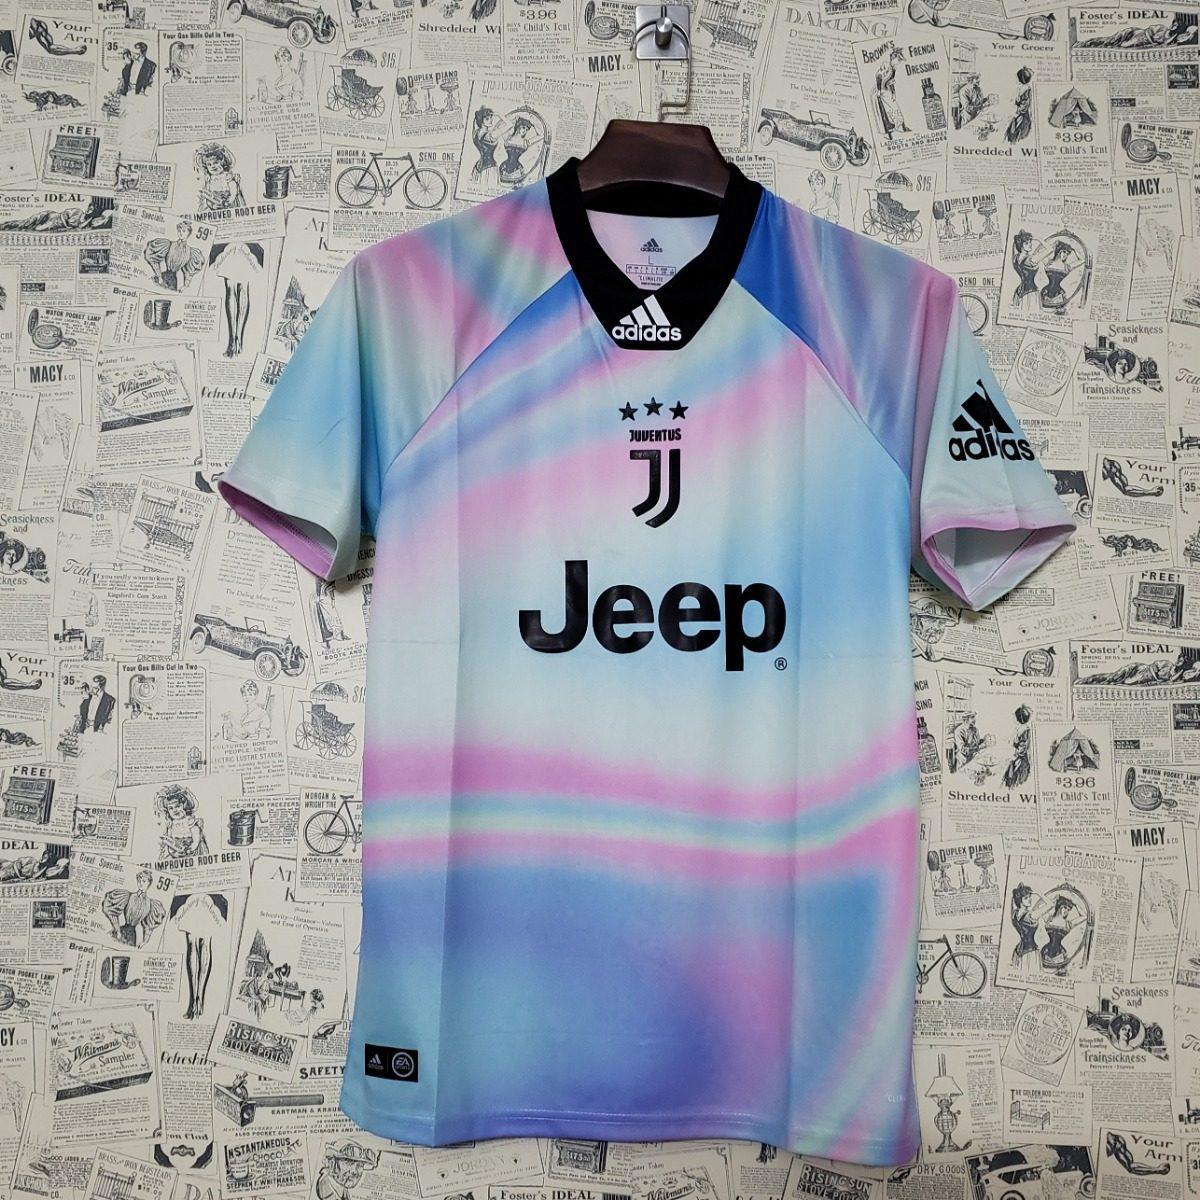 d561dbdd37890 Camisa Juventus 2018 Oficial adidas Edicao Ea Sports Fifa 19 - R ...